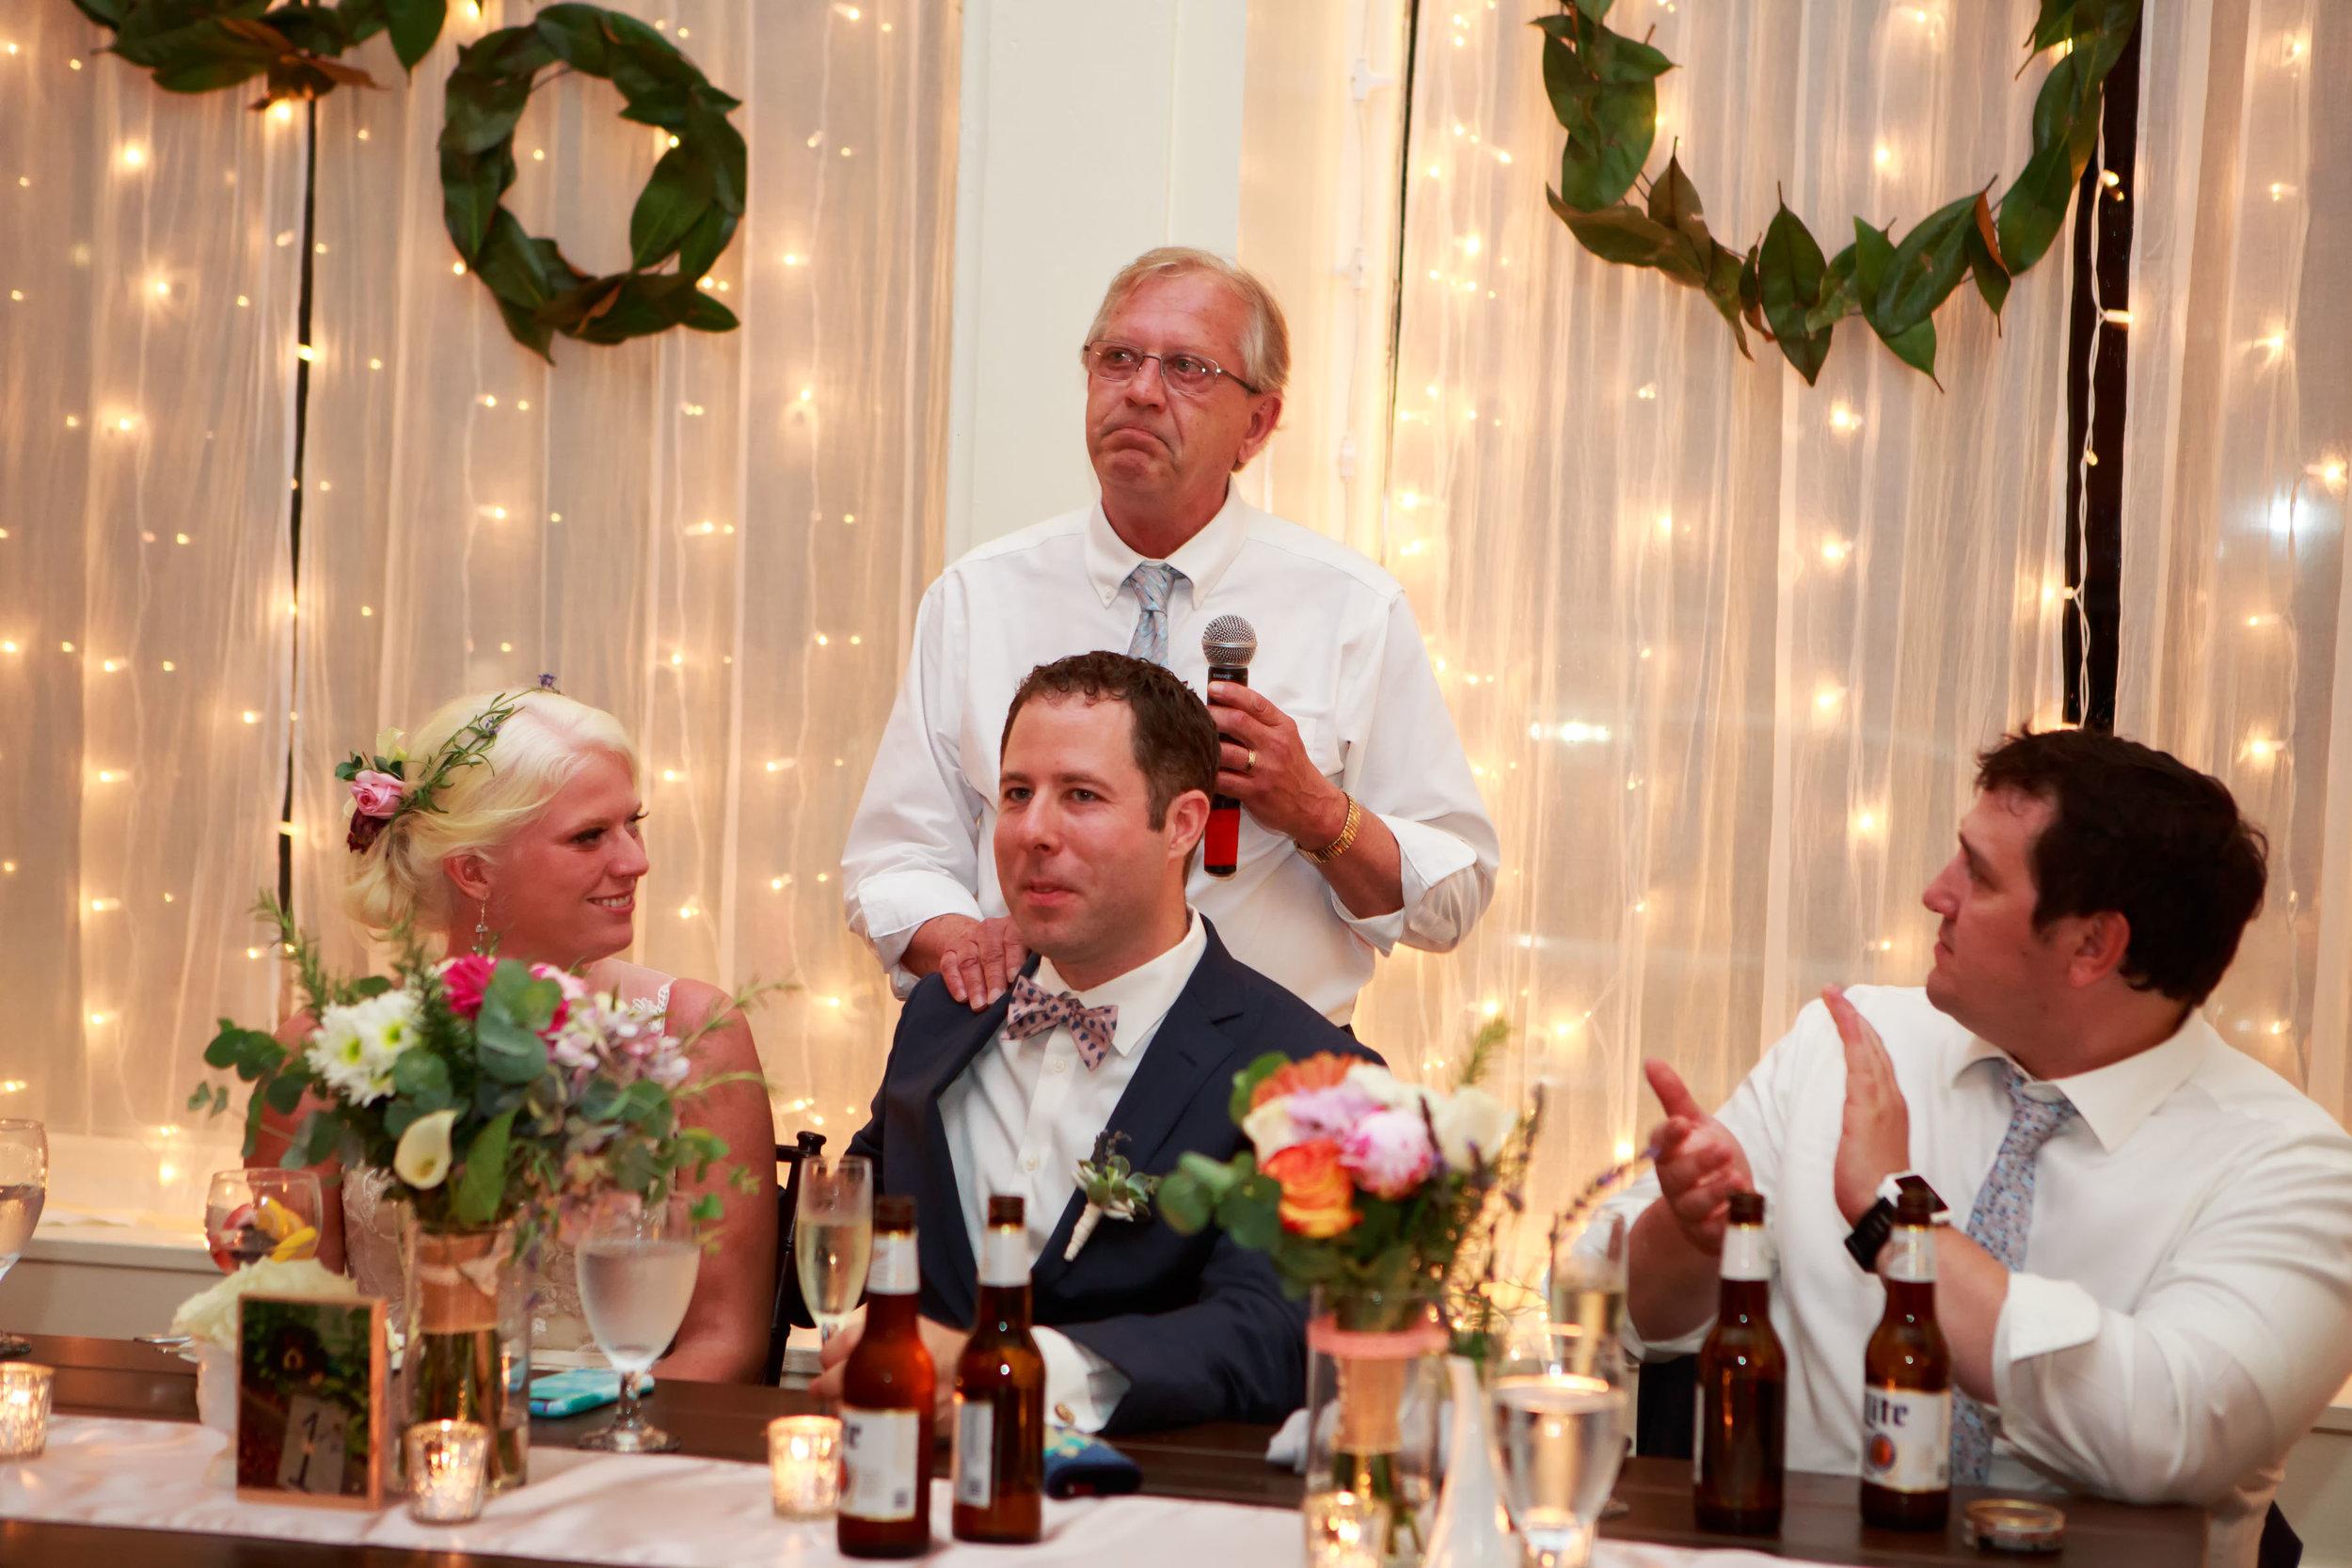 128-South-Wedding-Wilmington-NC-Photographer-Reception-110.jpg